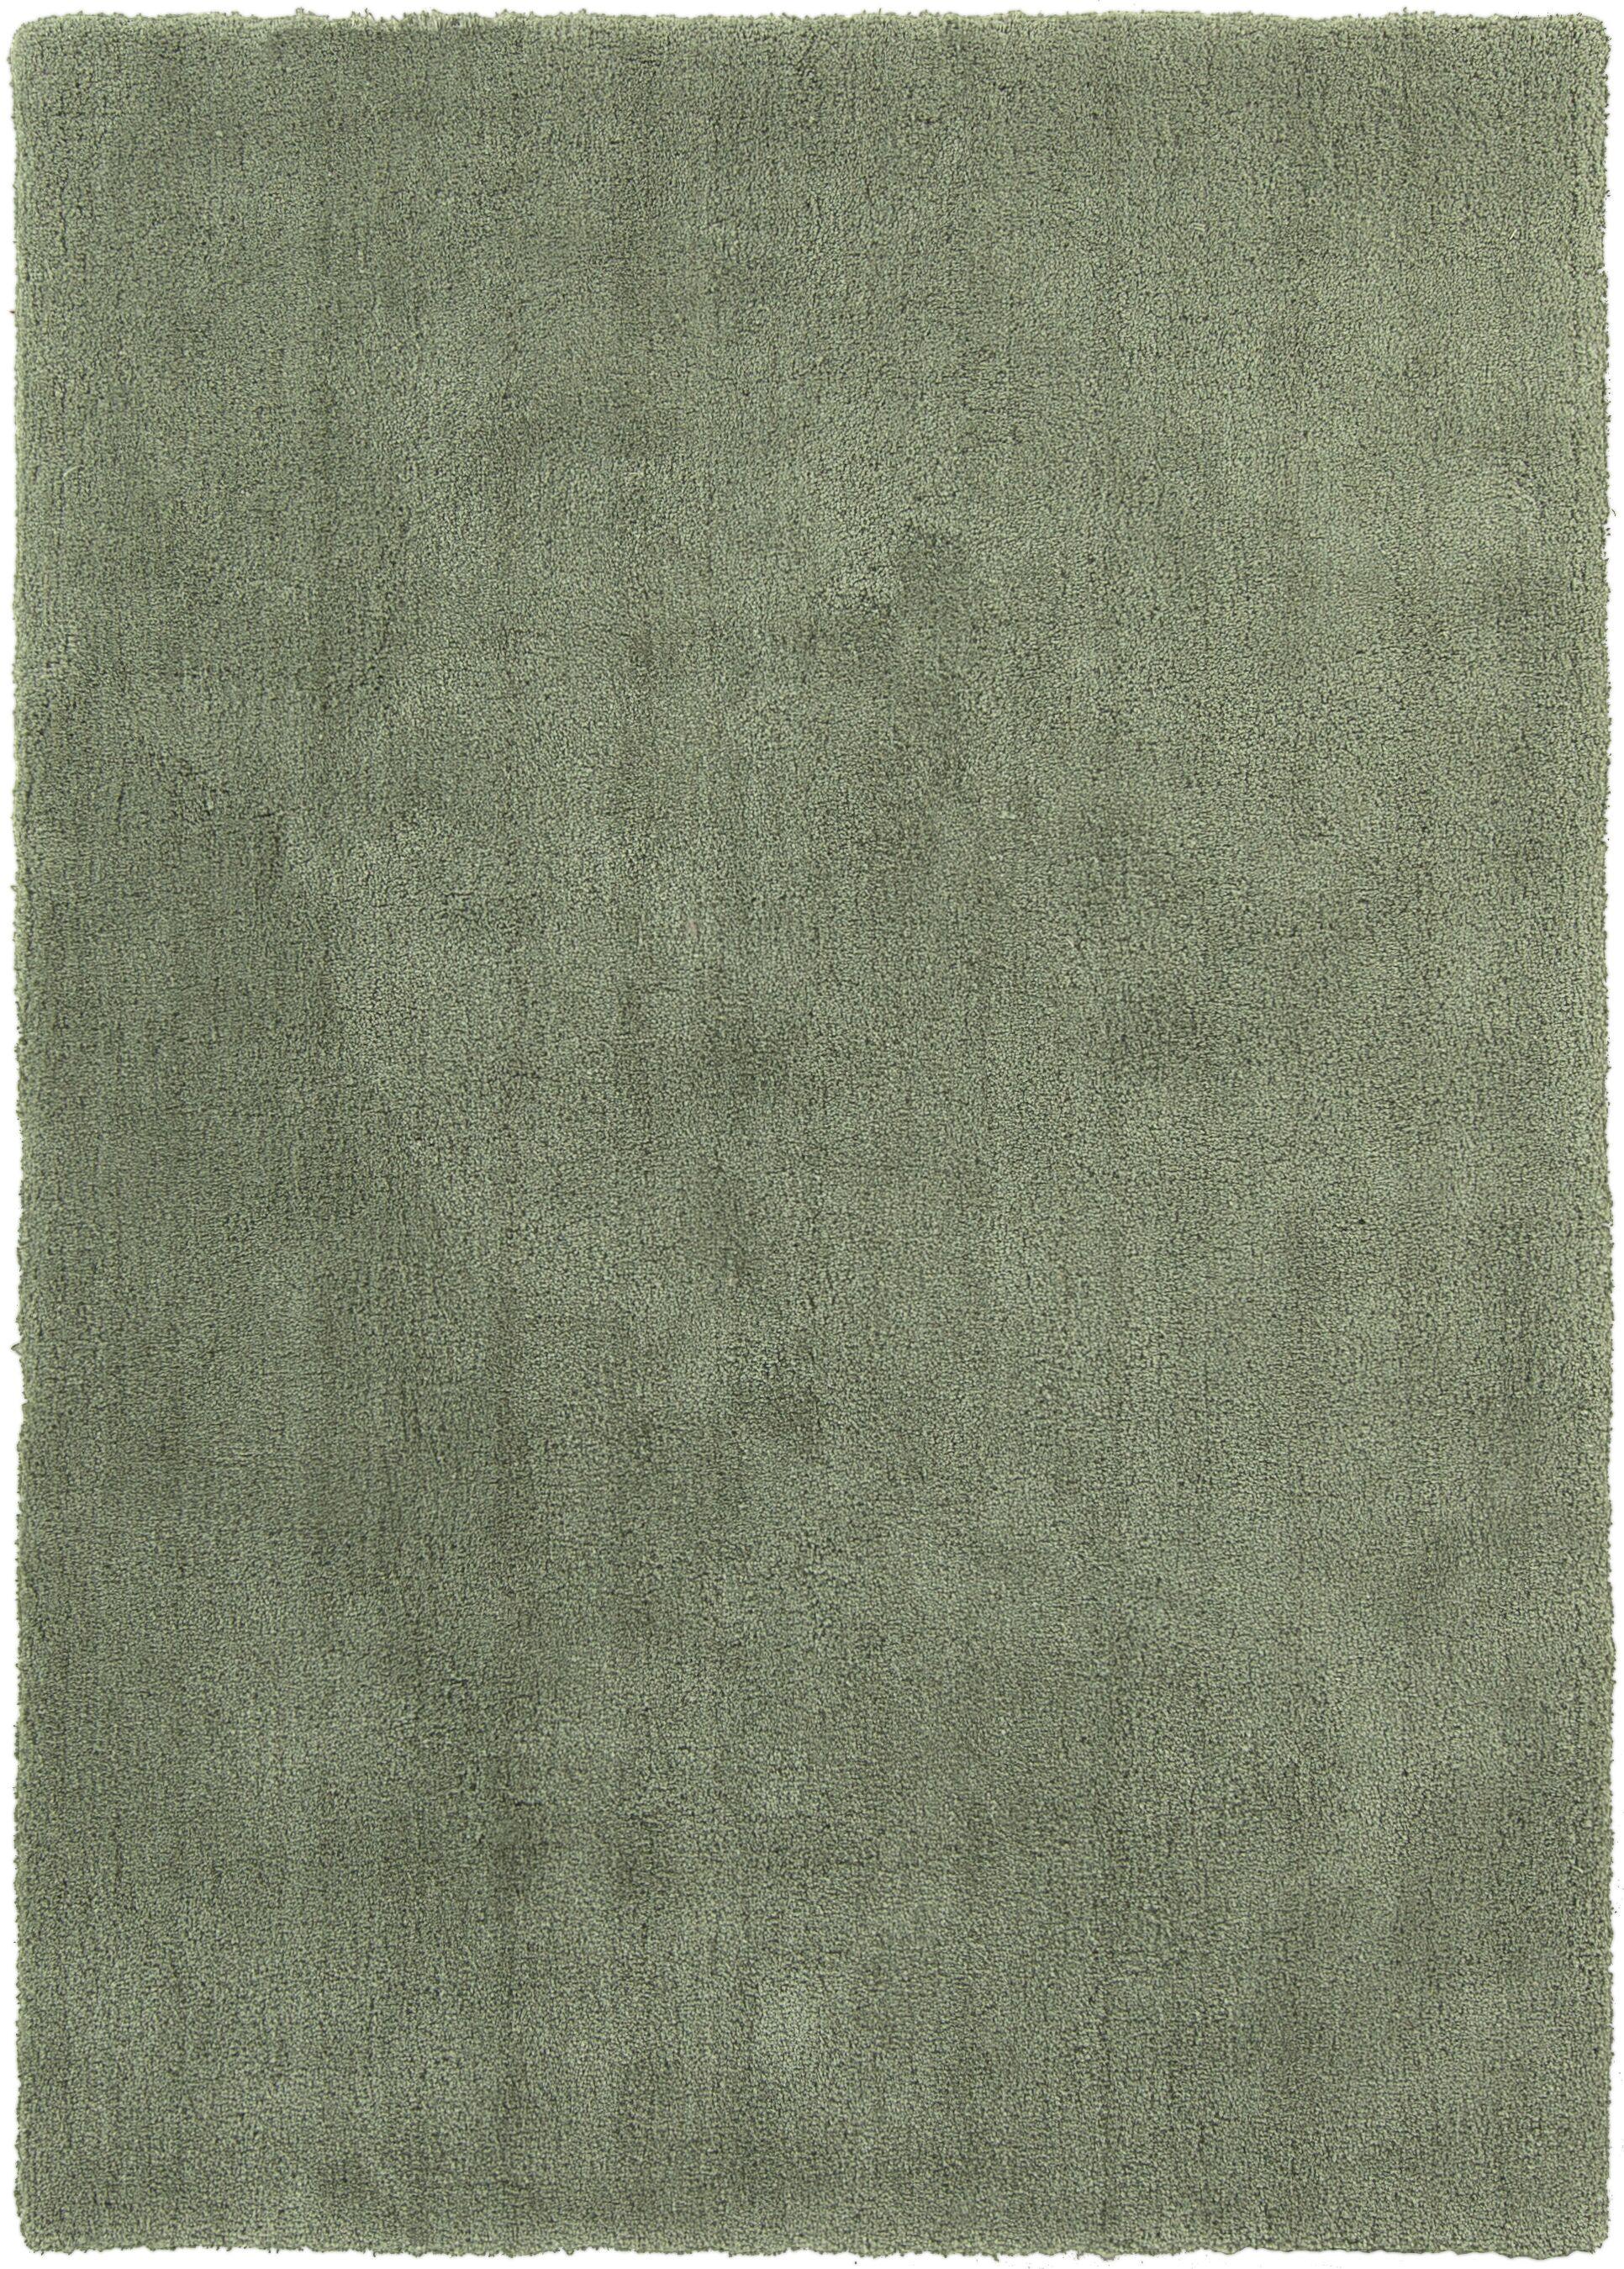 Braun Malachite Green Area Rug Rug Size: Rectangle 5' x 7'